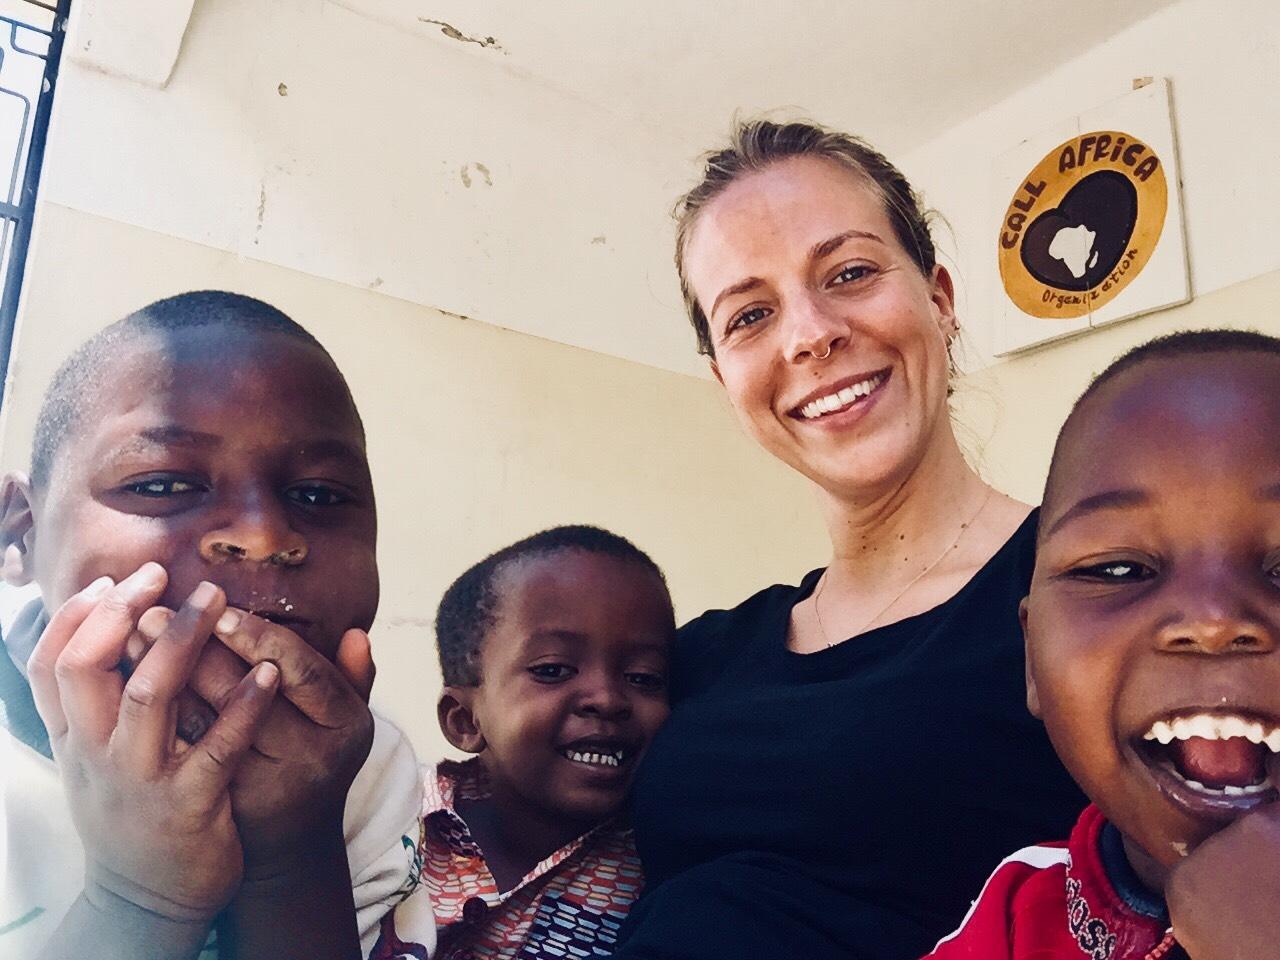 foto di Martina Furlan volontaria in servizio civile Africa